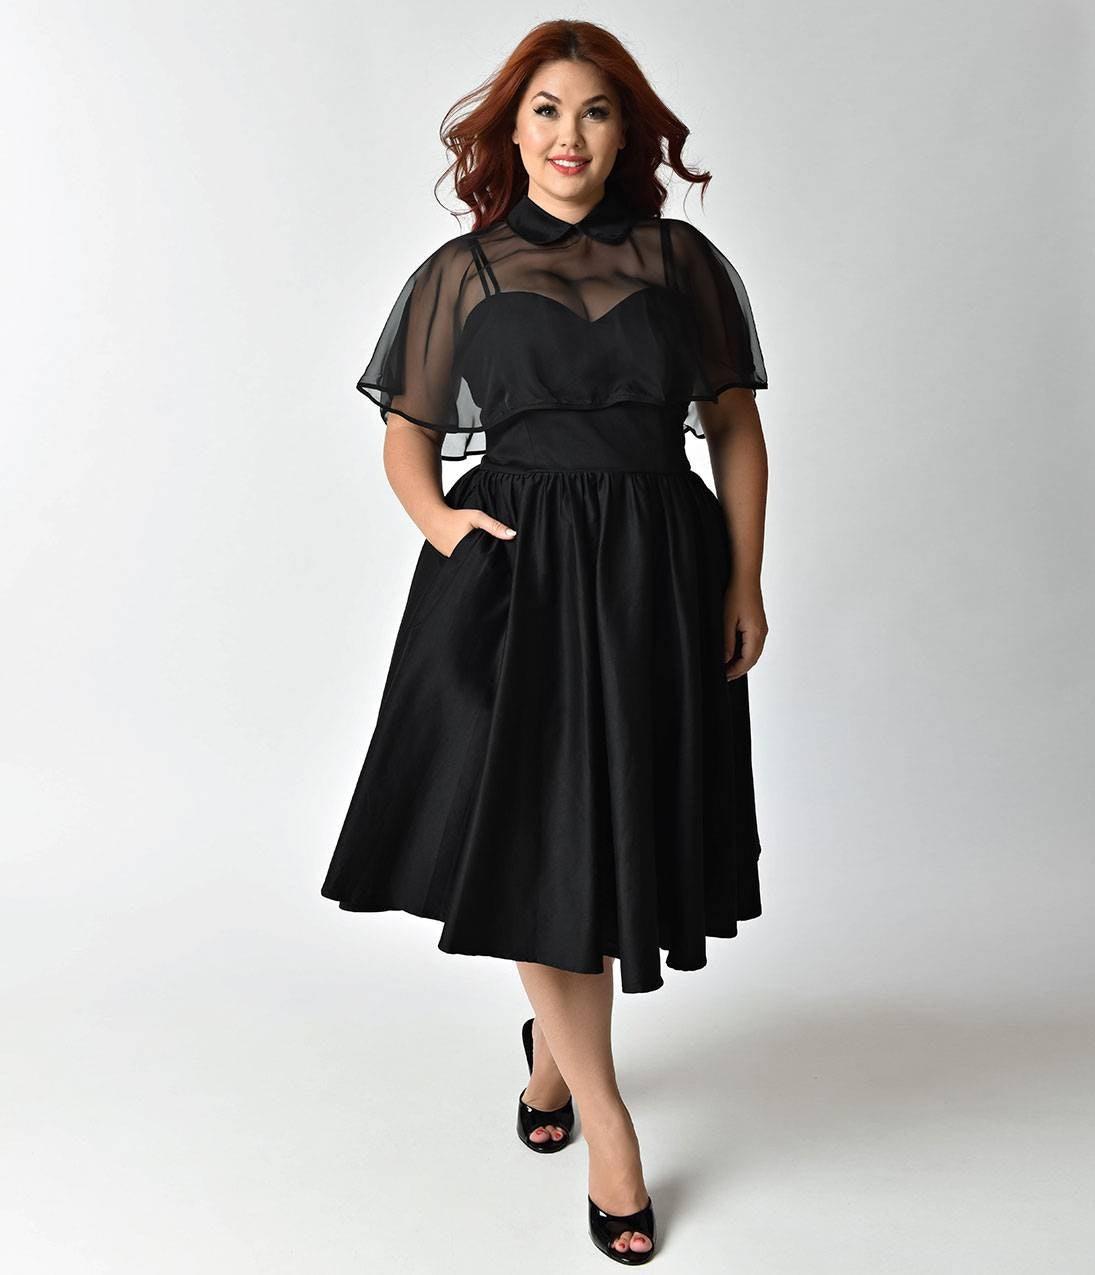 4b0ef1b0149ba Black Short Sleeve Mesh Peak Collar Skater Dress | Saddha